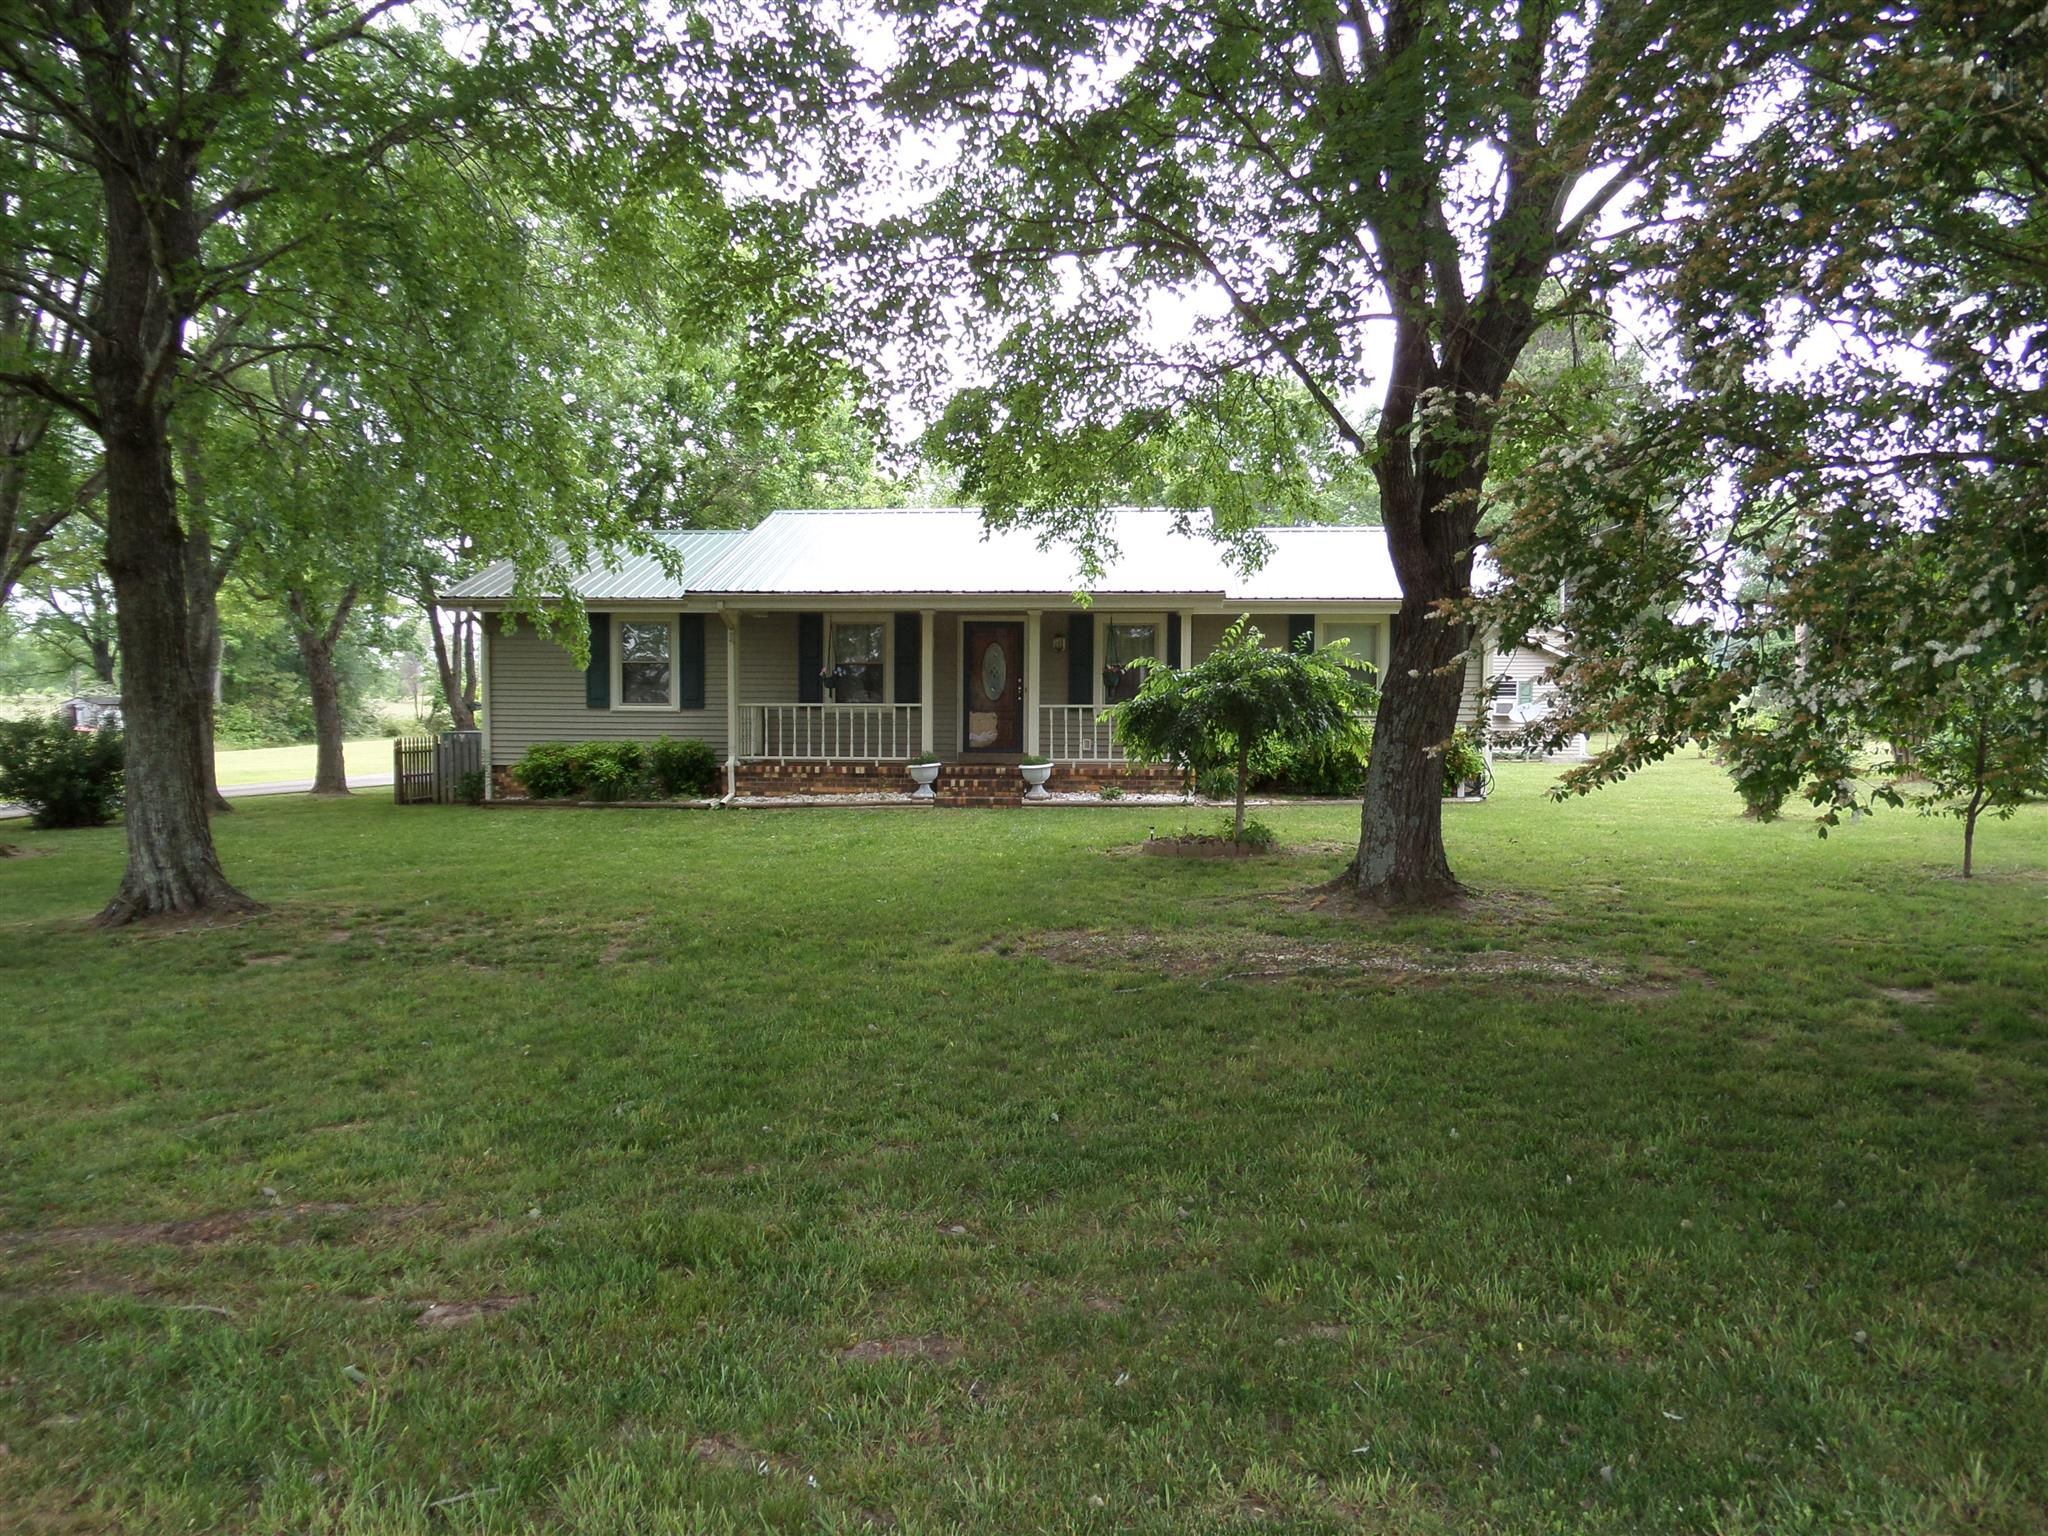 546 Weakley Creek Rd, Lawrenceburg, TN 38464